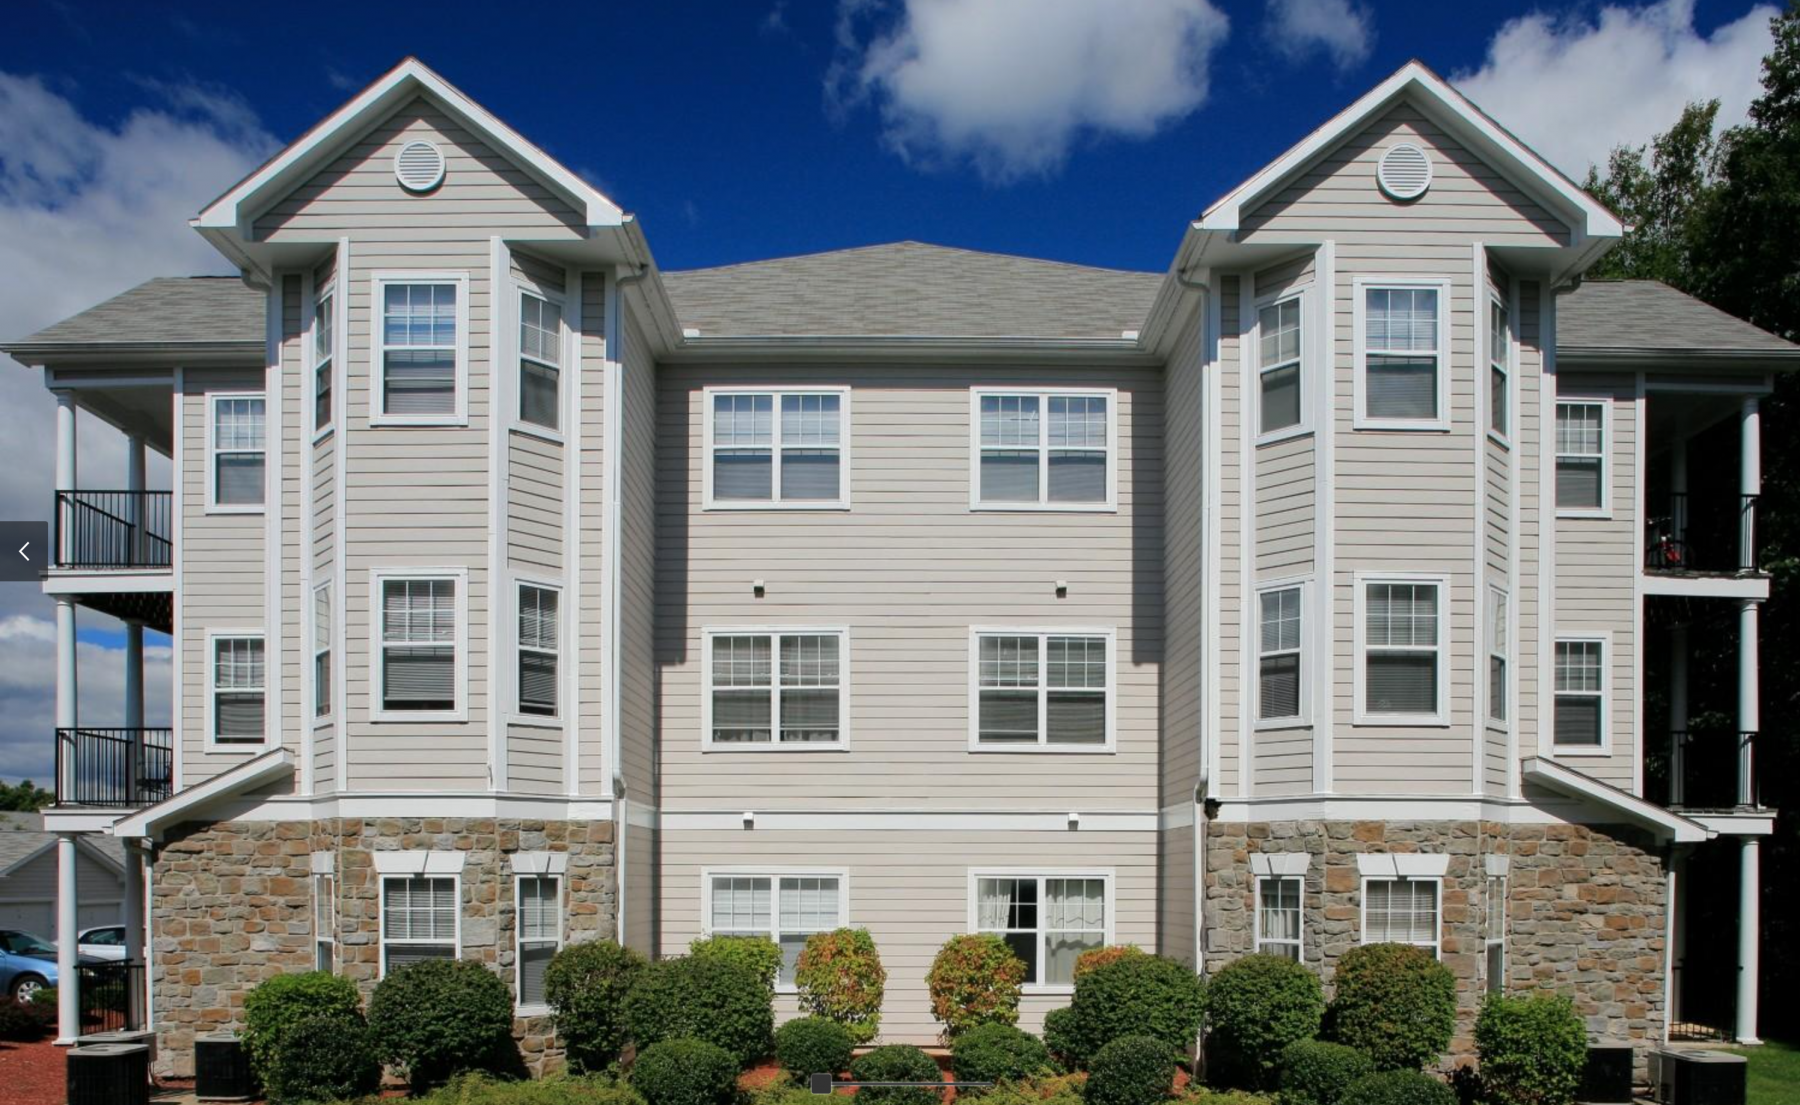 2 - Typicla Apartment Building copy